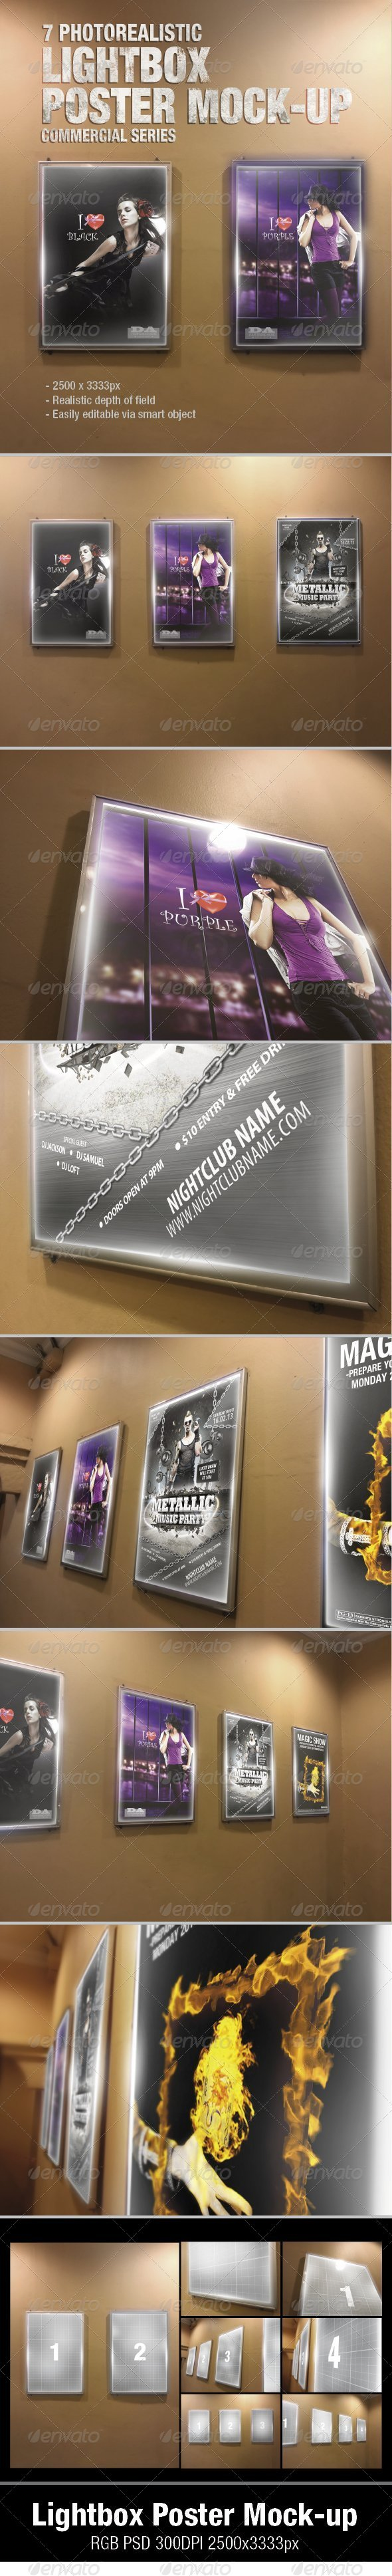 Lightbox Poster Mock-Ups - Posters Print